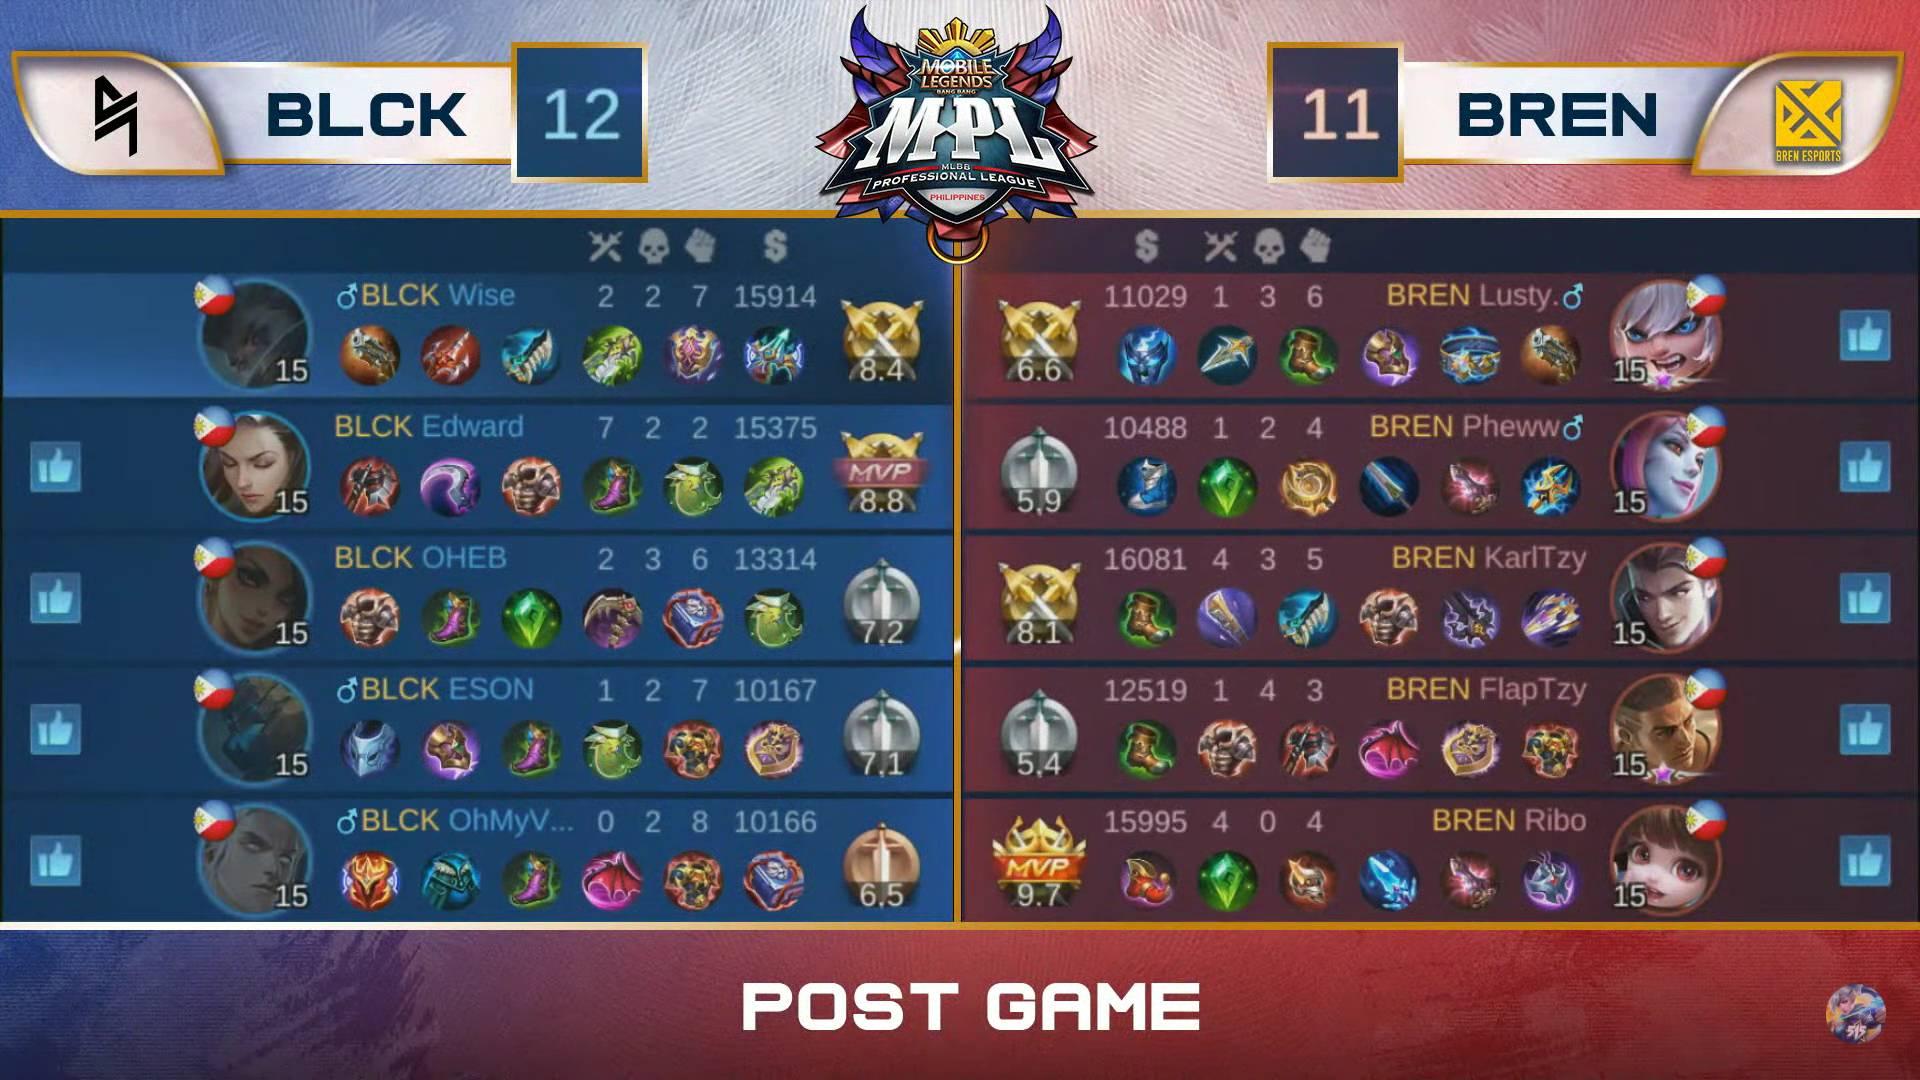 MPL-PH-Season-7-Bren-def-Blacklist-Game-2 Lusty clutch knock-up triggers Bren's statement comeback vs Blacklist in MPL PH ESports Mobile Legends MPL-PH News  - philippine sports news